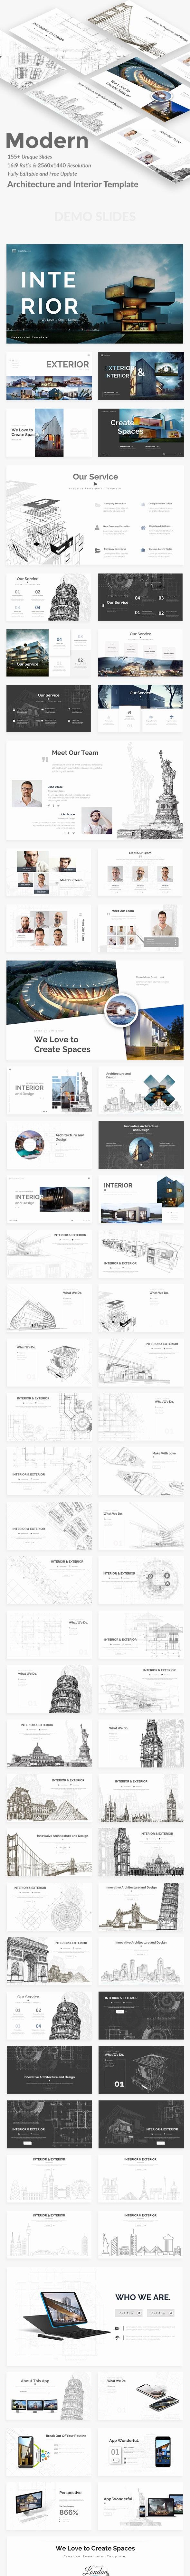 Modern - Architecture and Interior Google Slide Template - Google Slides Presentation Templates